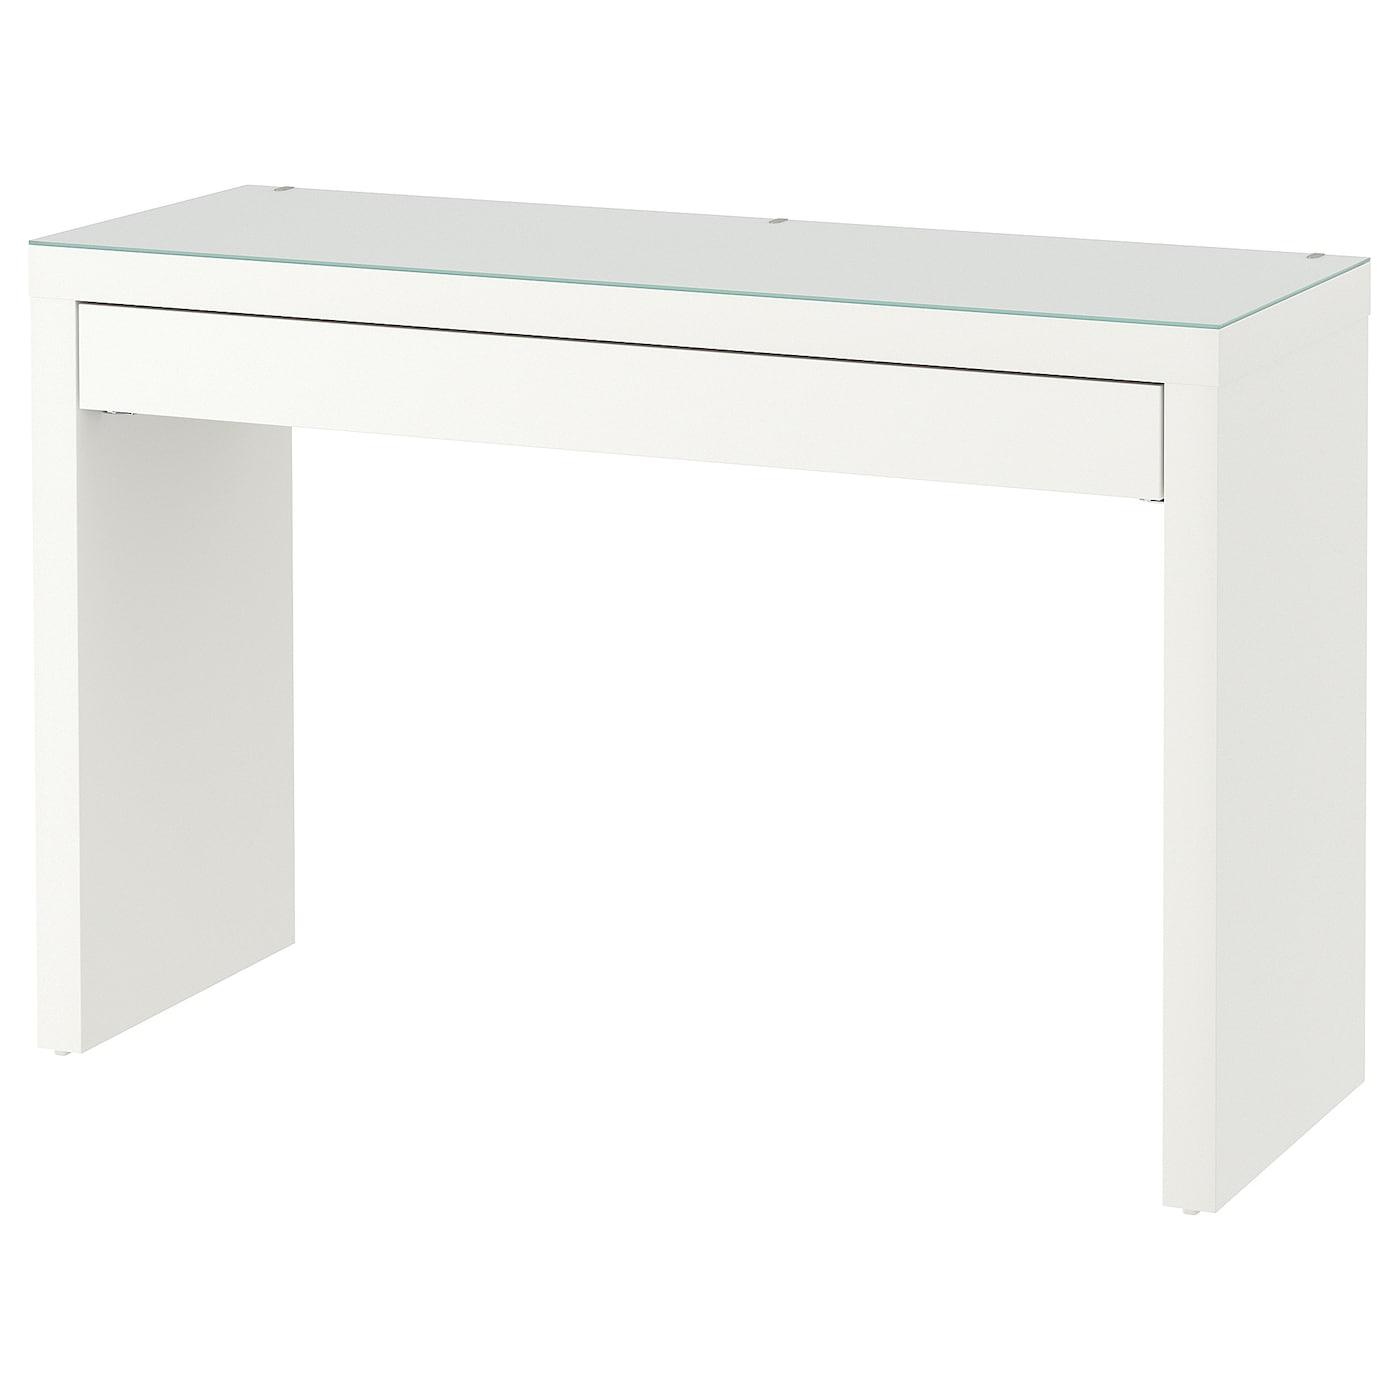 Malm Dressing Table White 47 1 4x16 1 8 120x41 Cm Ikea